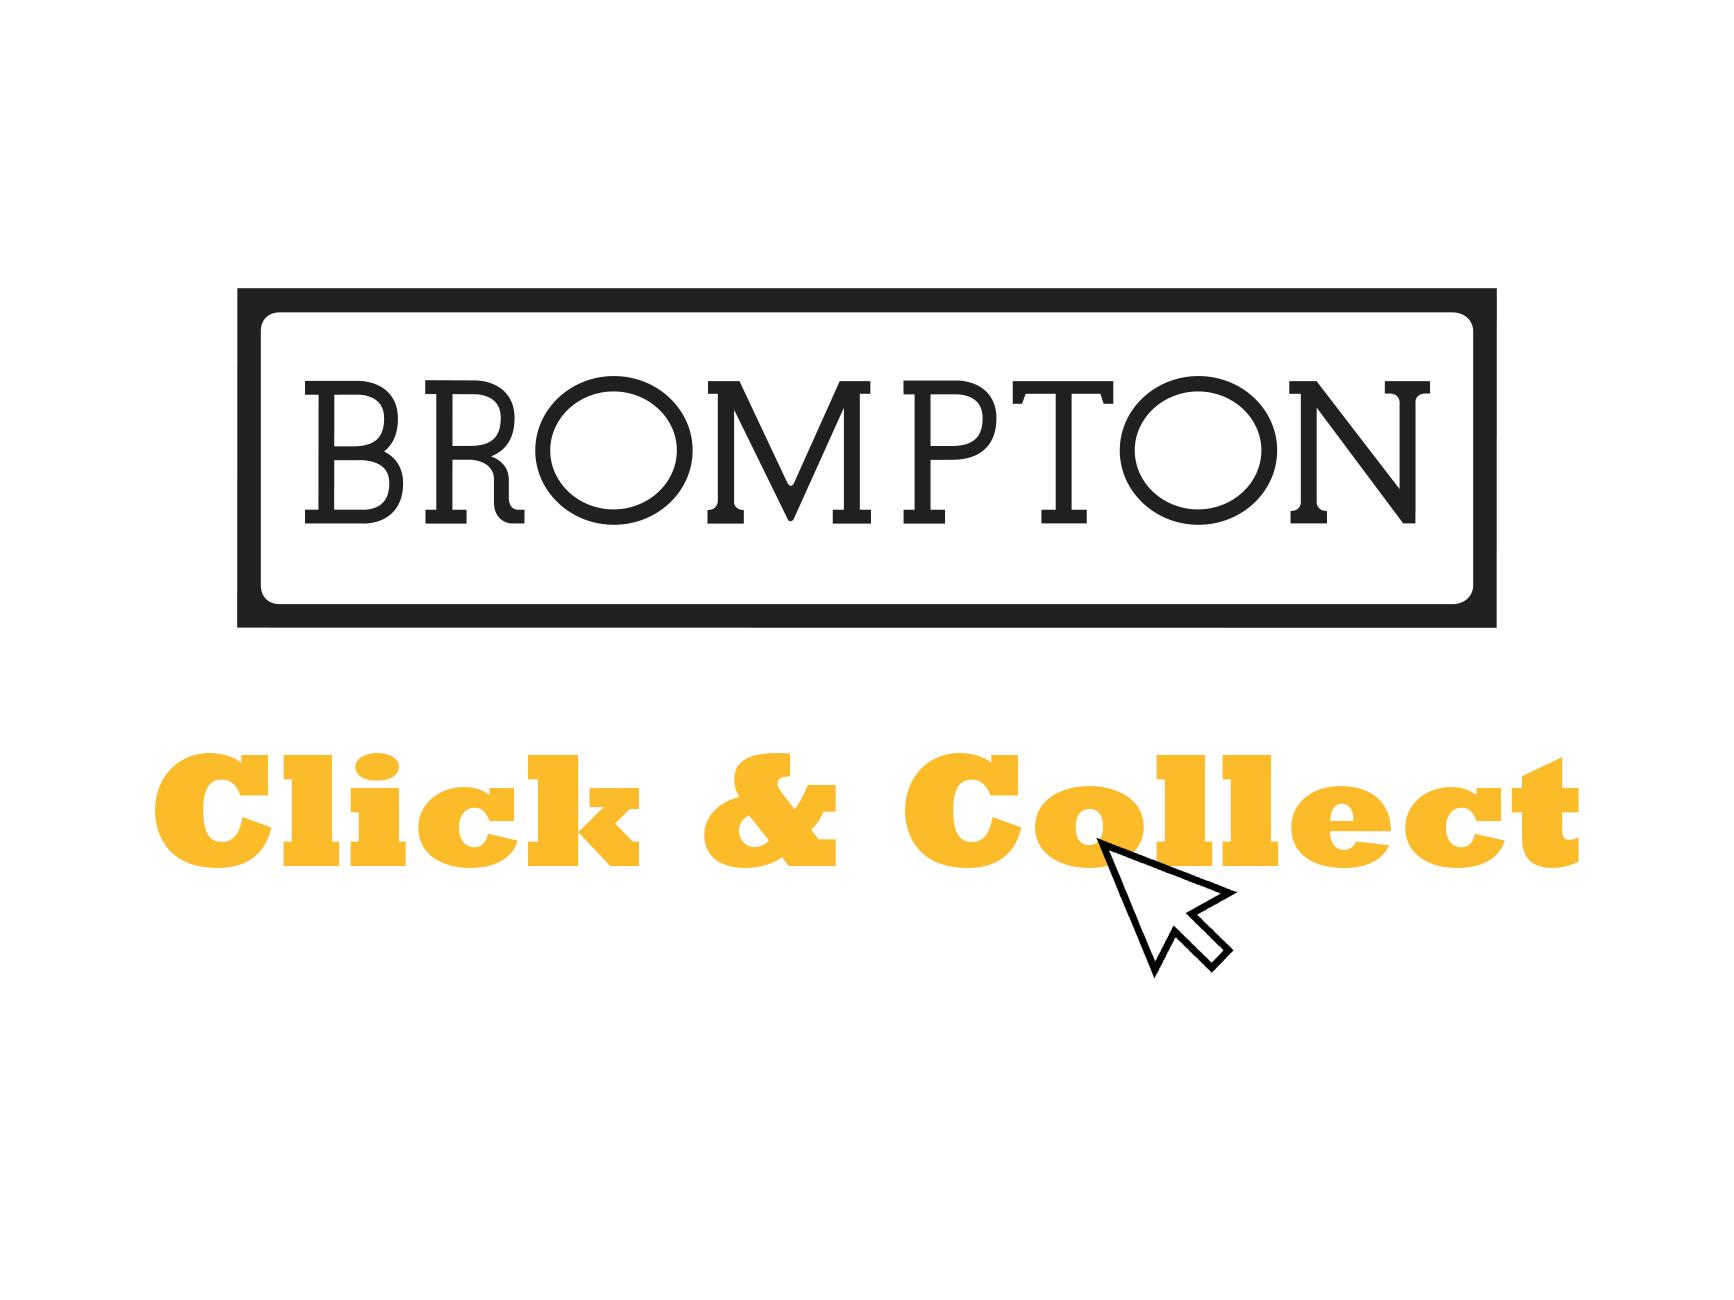 Brompton Brompton Click&Collect